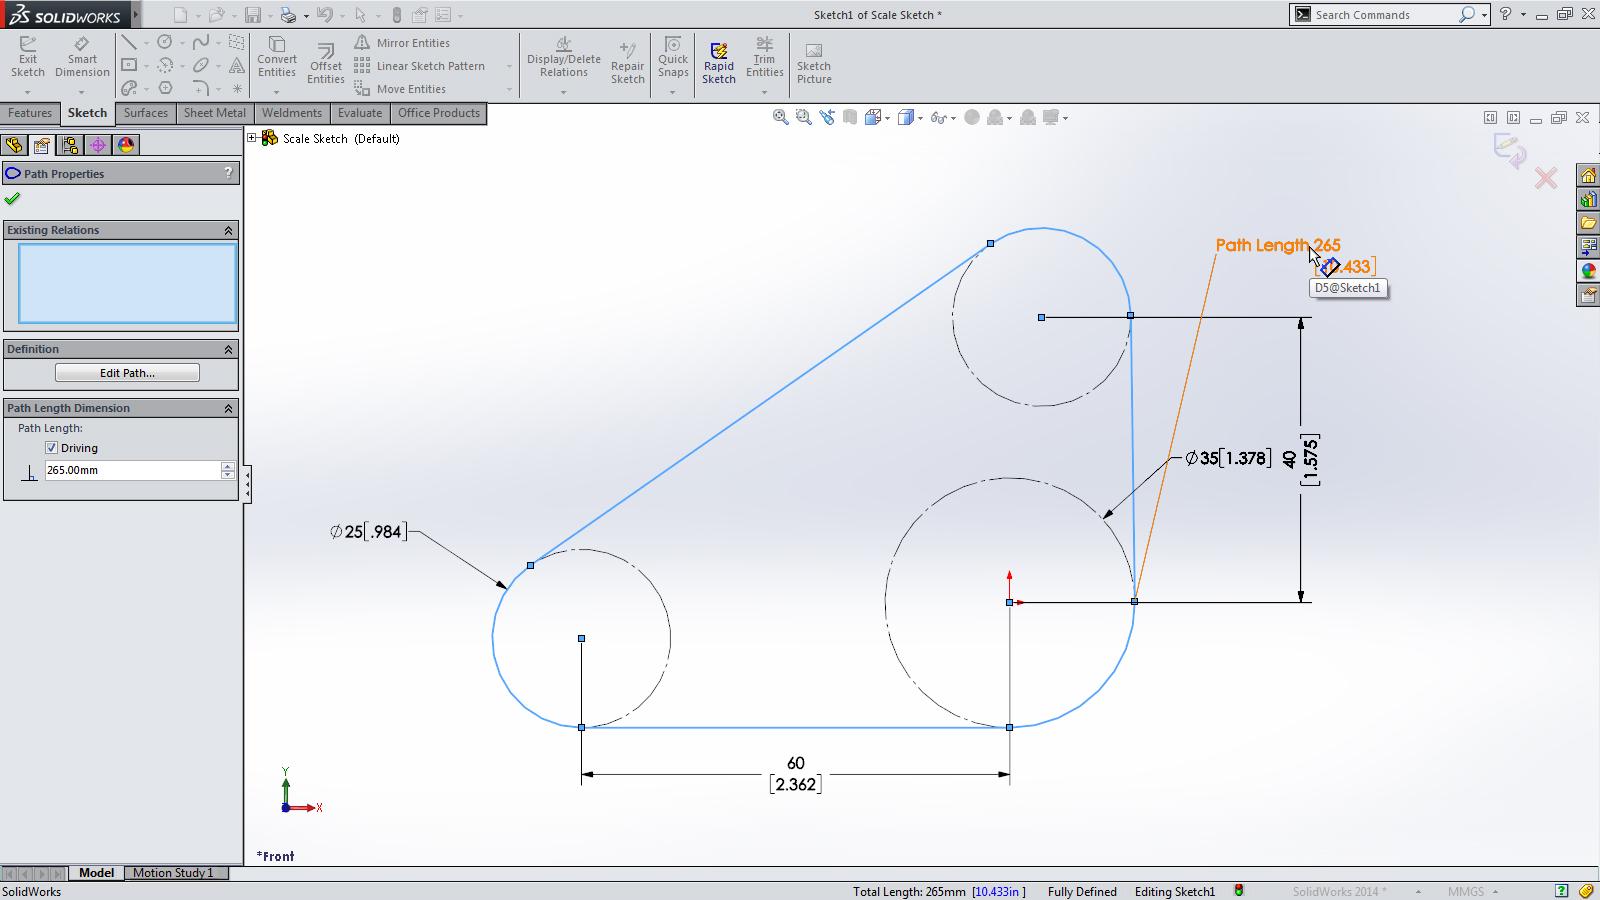 SolidWorks 2014 Sneak Peek: Path Length Dimension